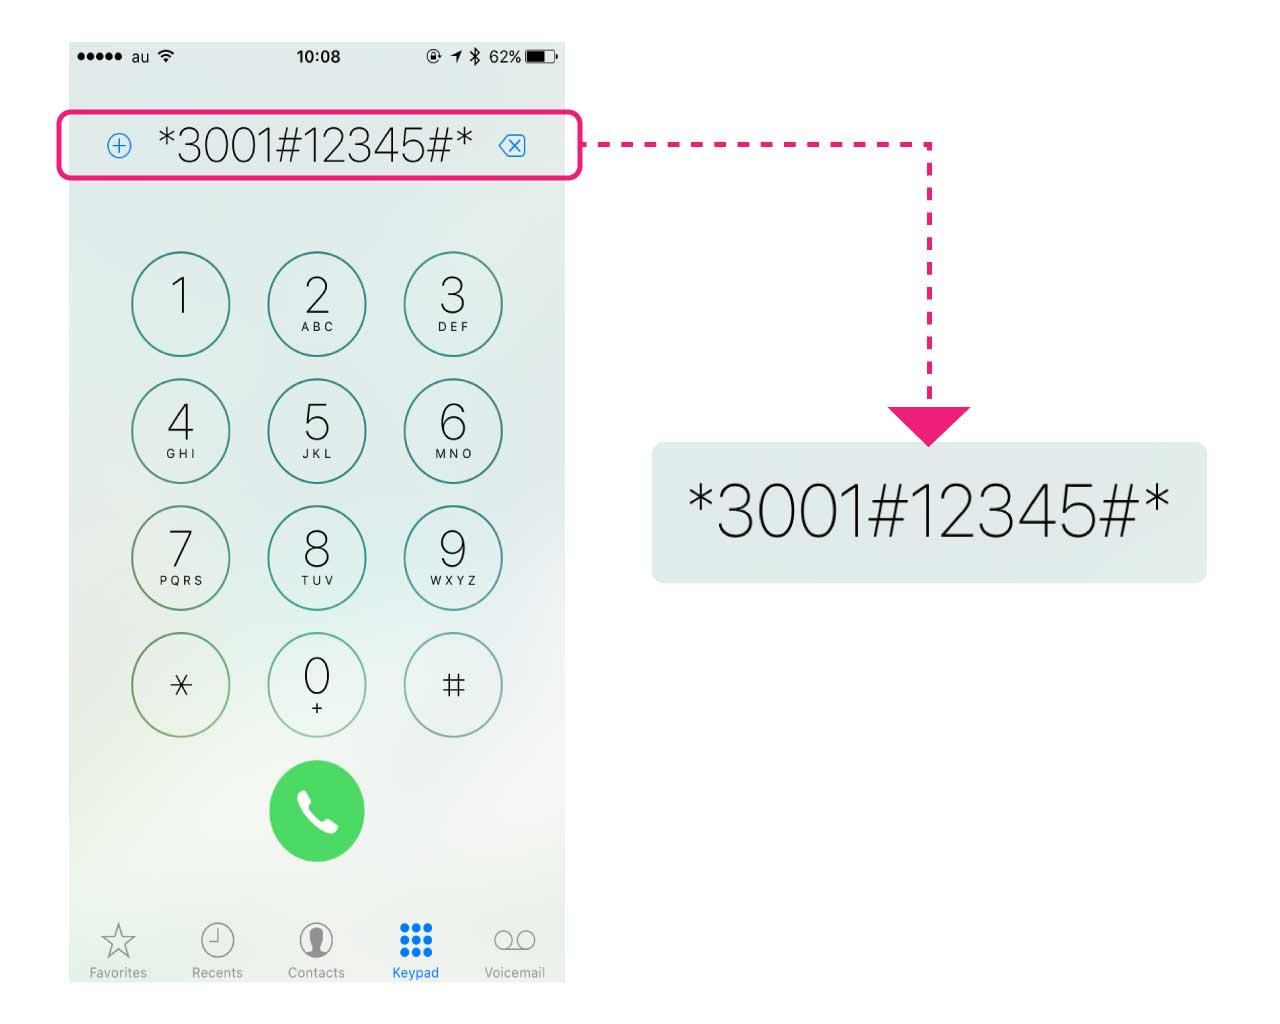 iphone-reception-setting-technic-fieldtest-1